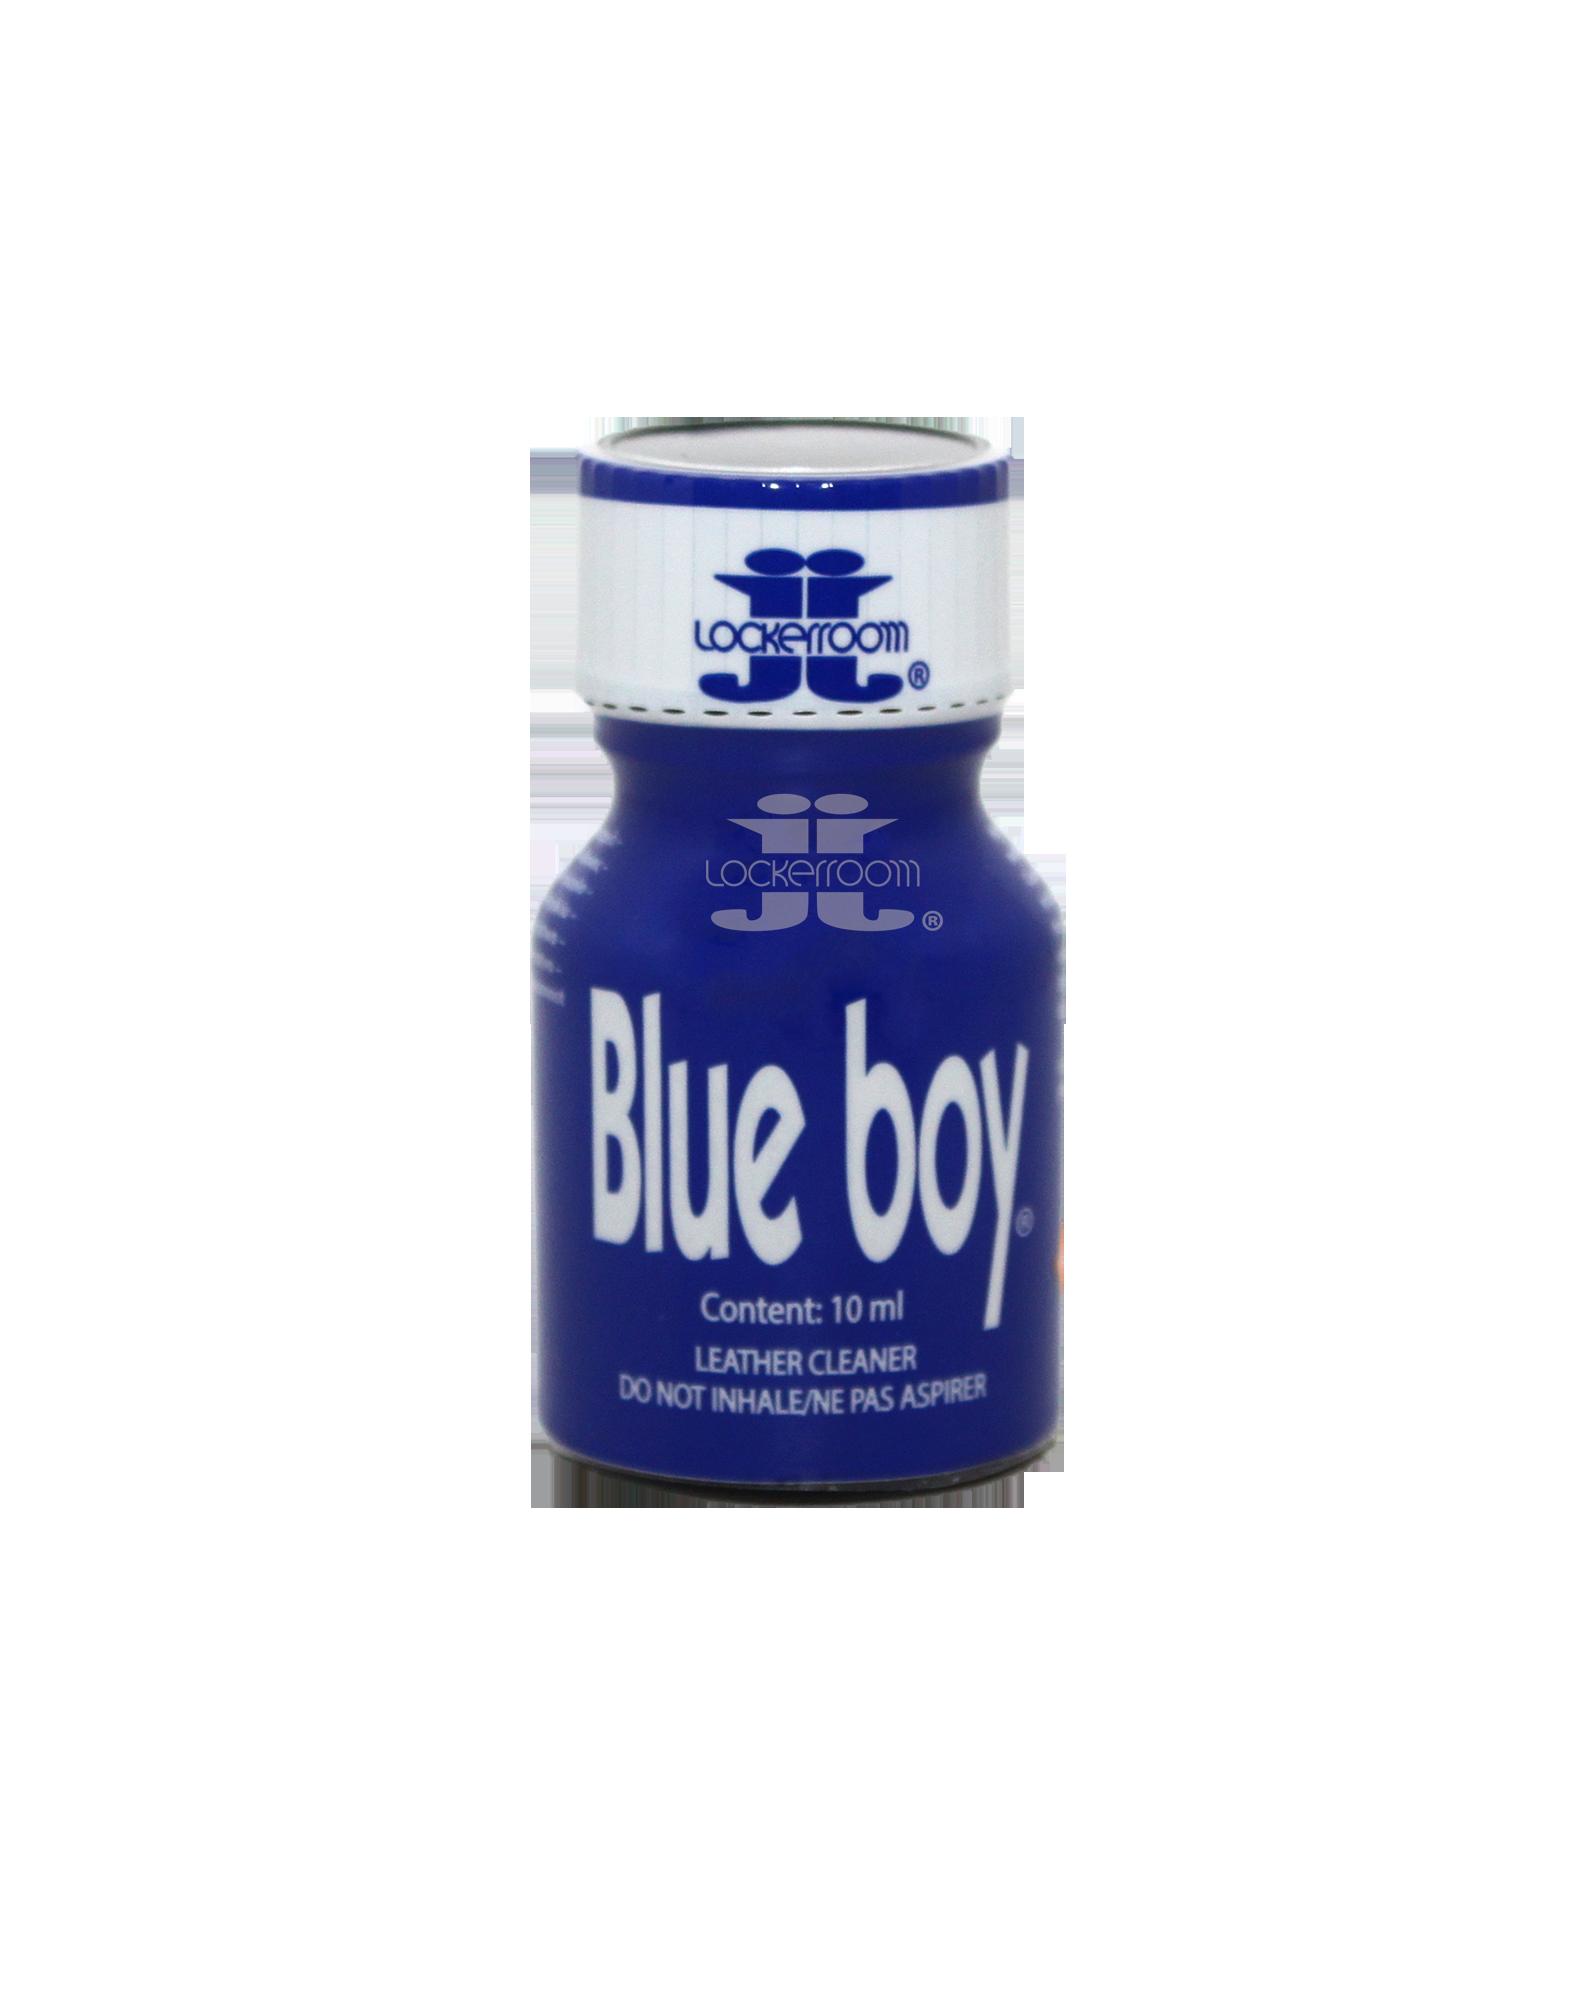 Blue Boy 10mL Bottle with Watermark